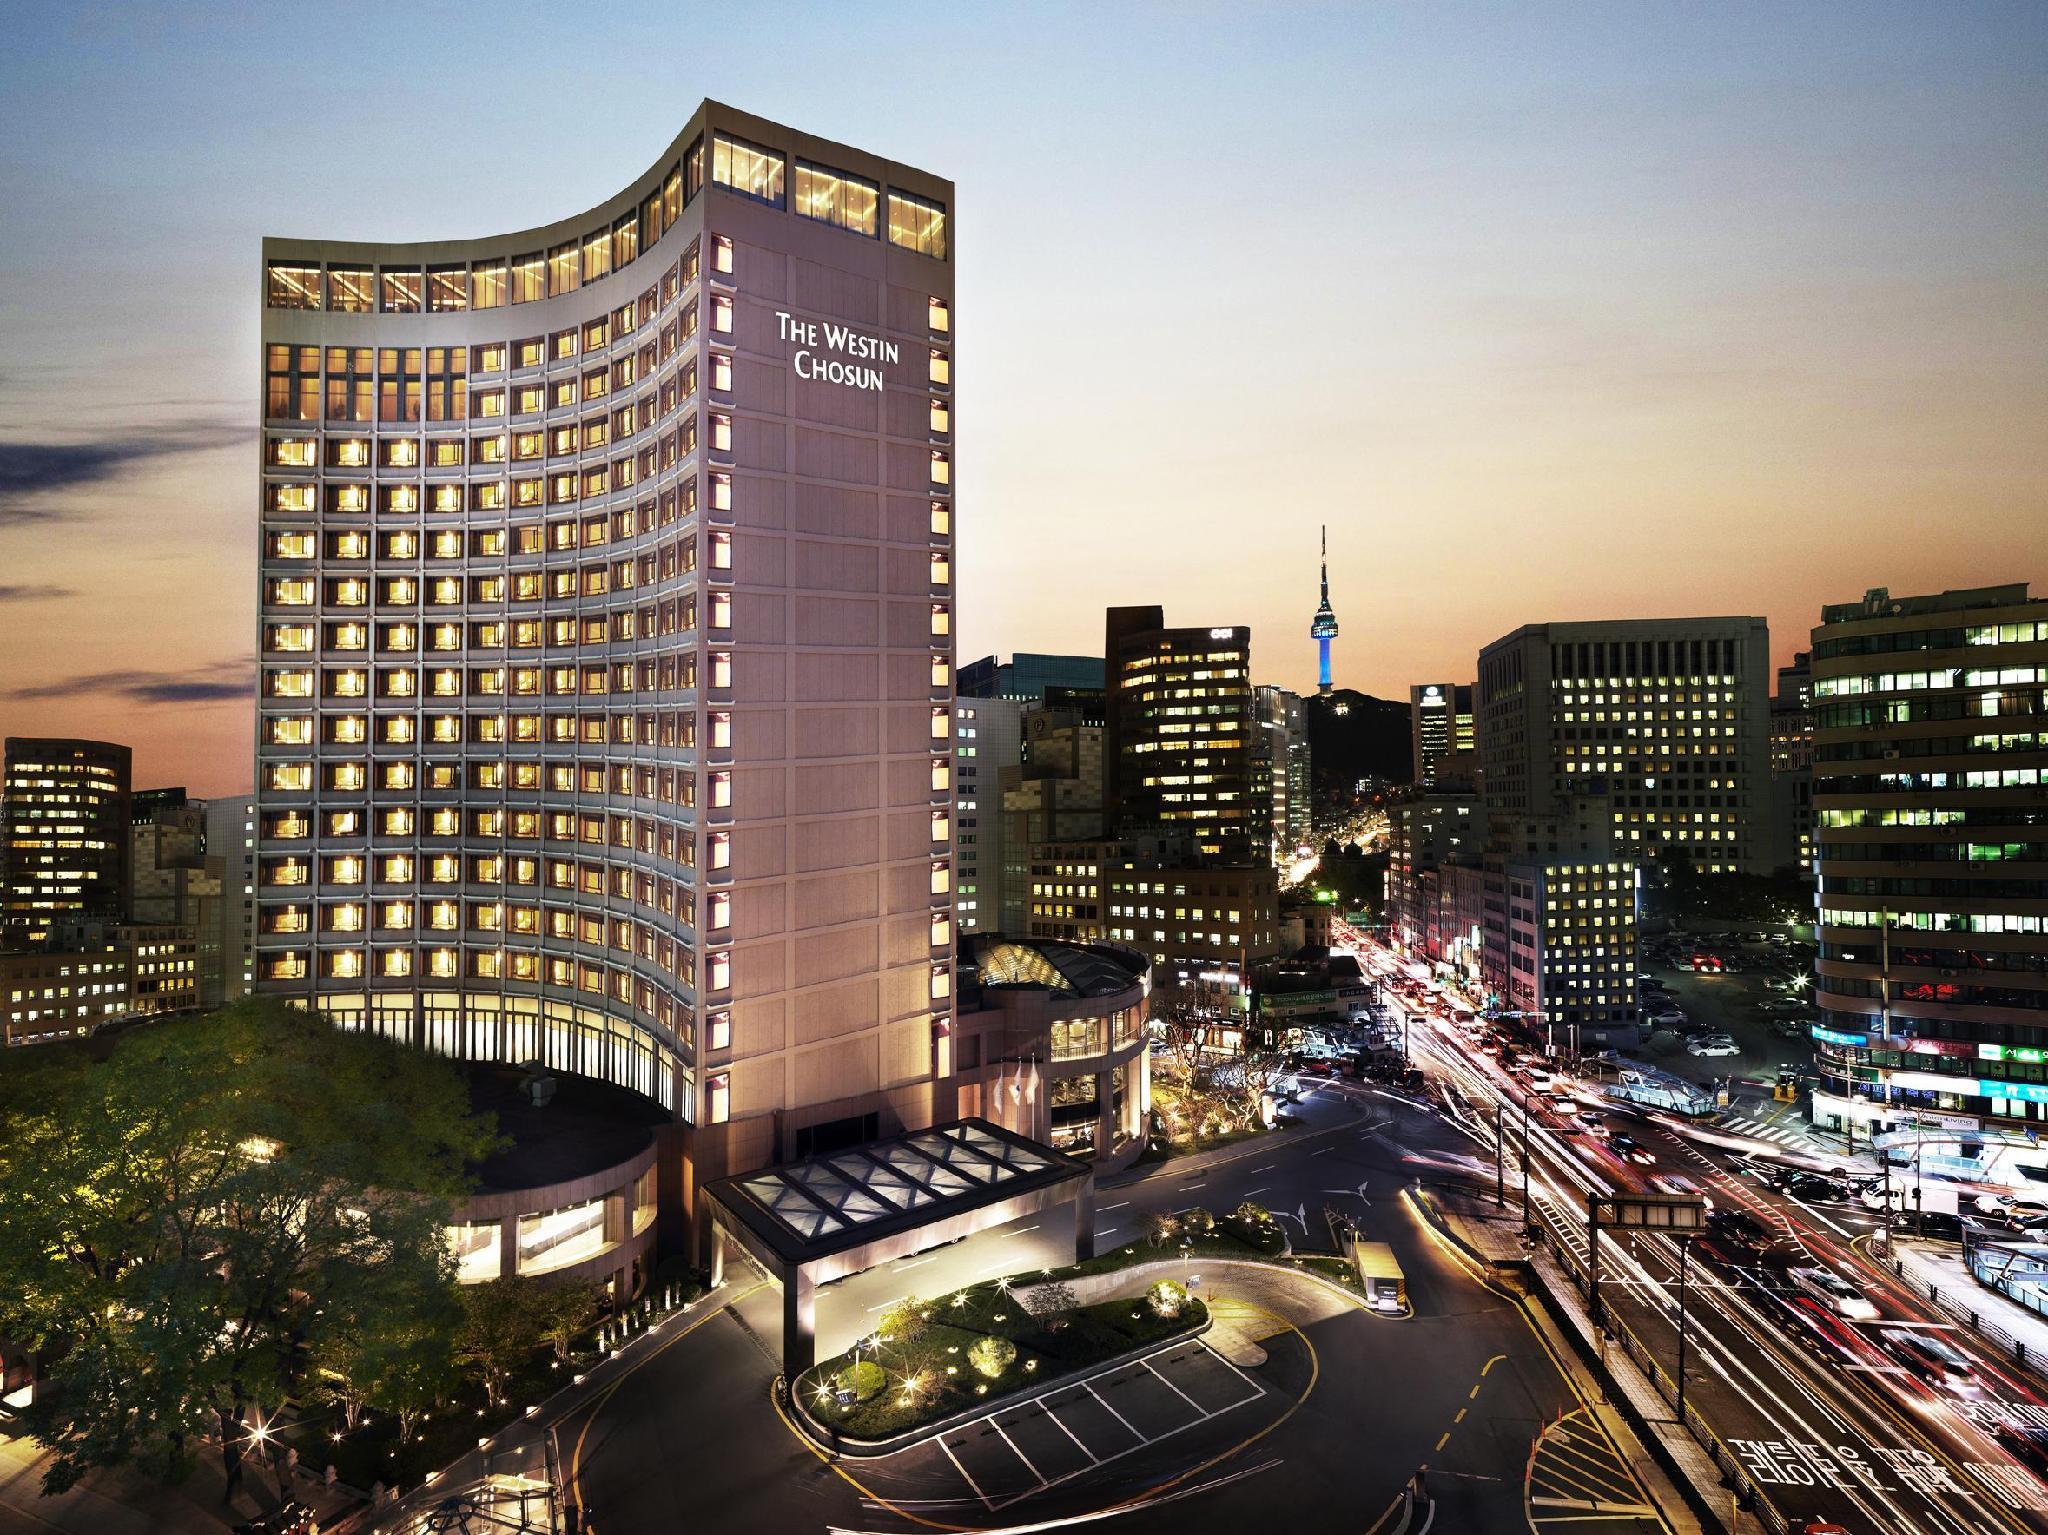 The Westin Chosun Seoul Seoul